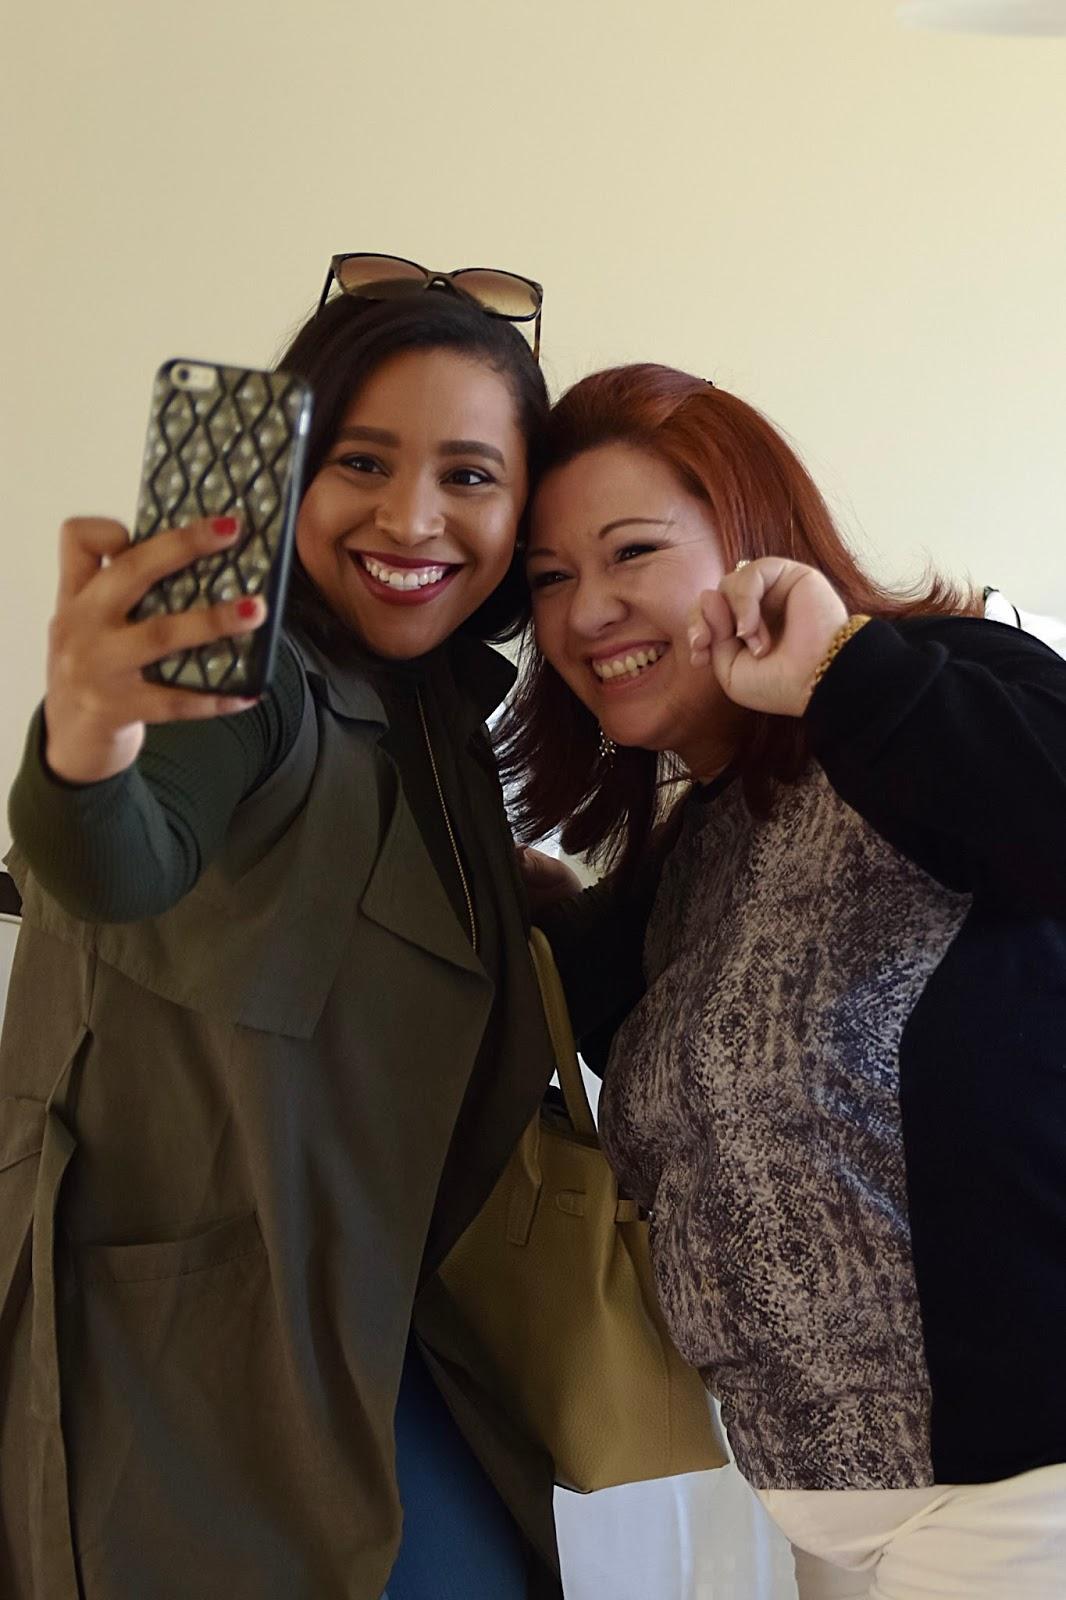 Evelyn Brooks, Blogger event, peruvian jewlery, jewelry event, evelyn brooks designs, blogger shopping